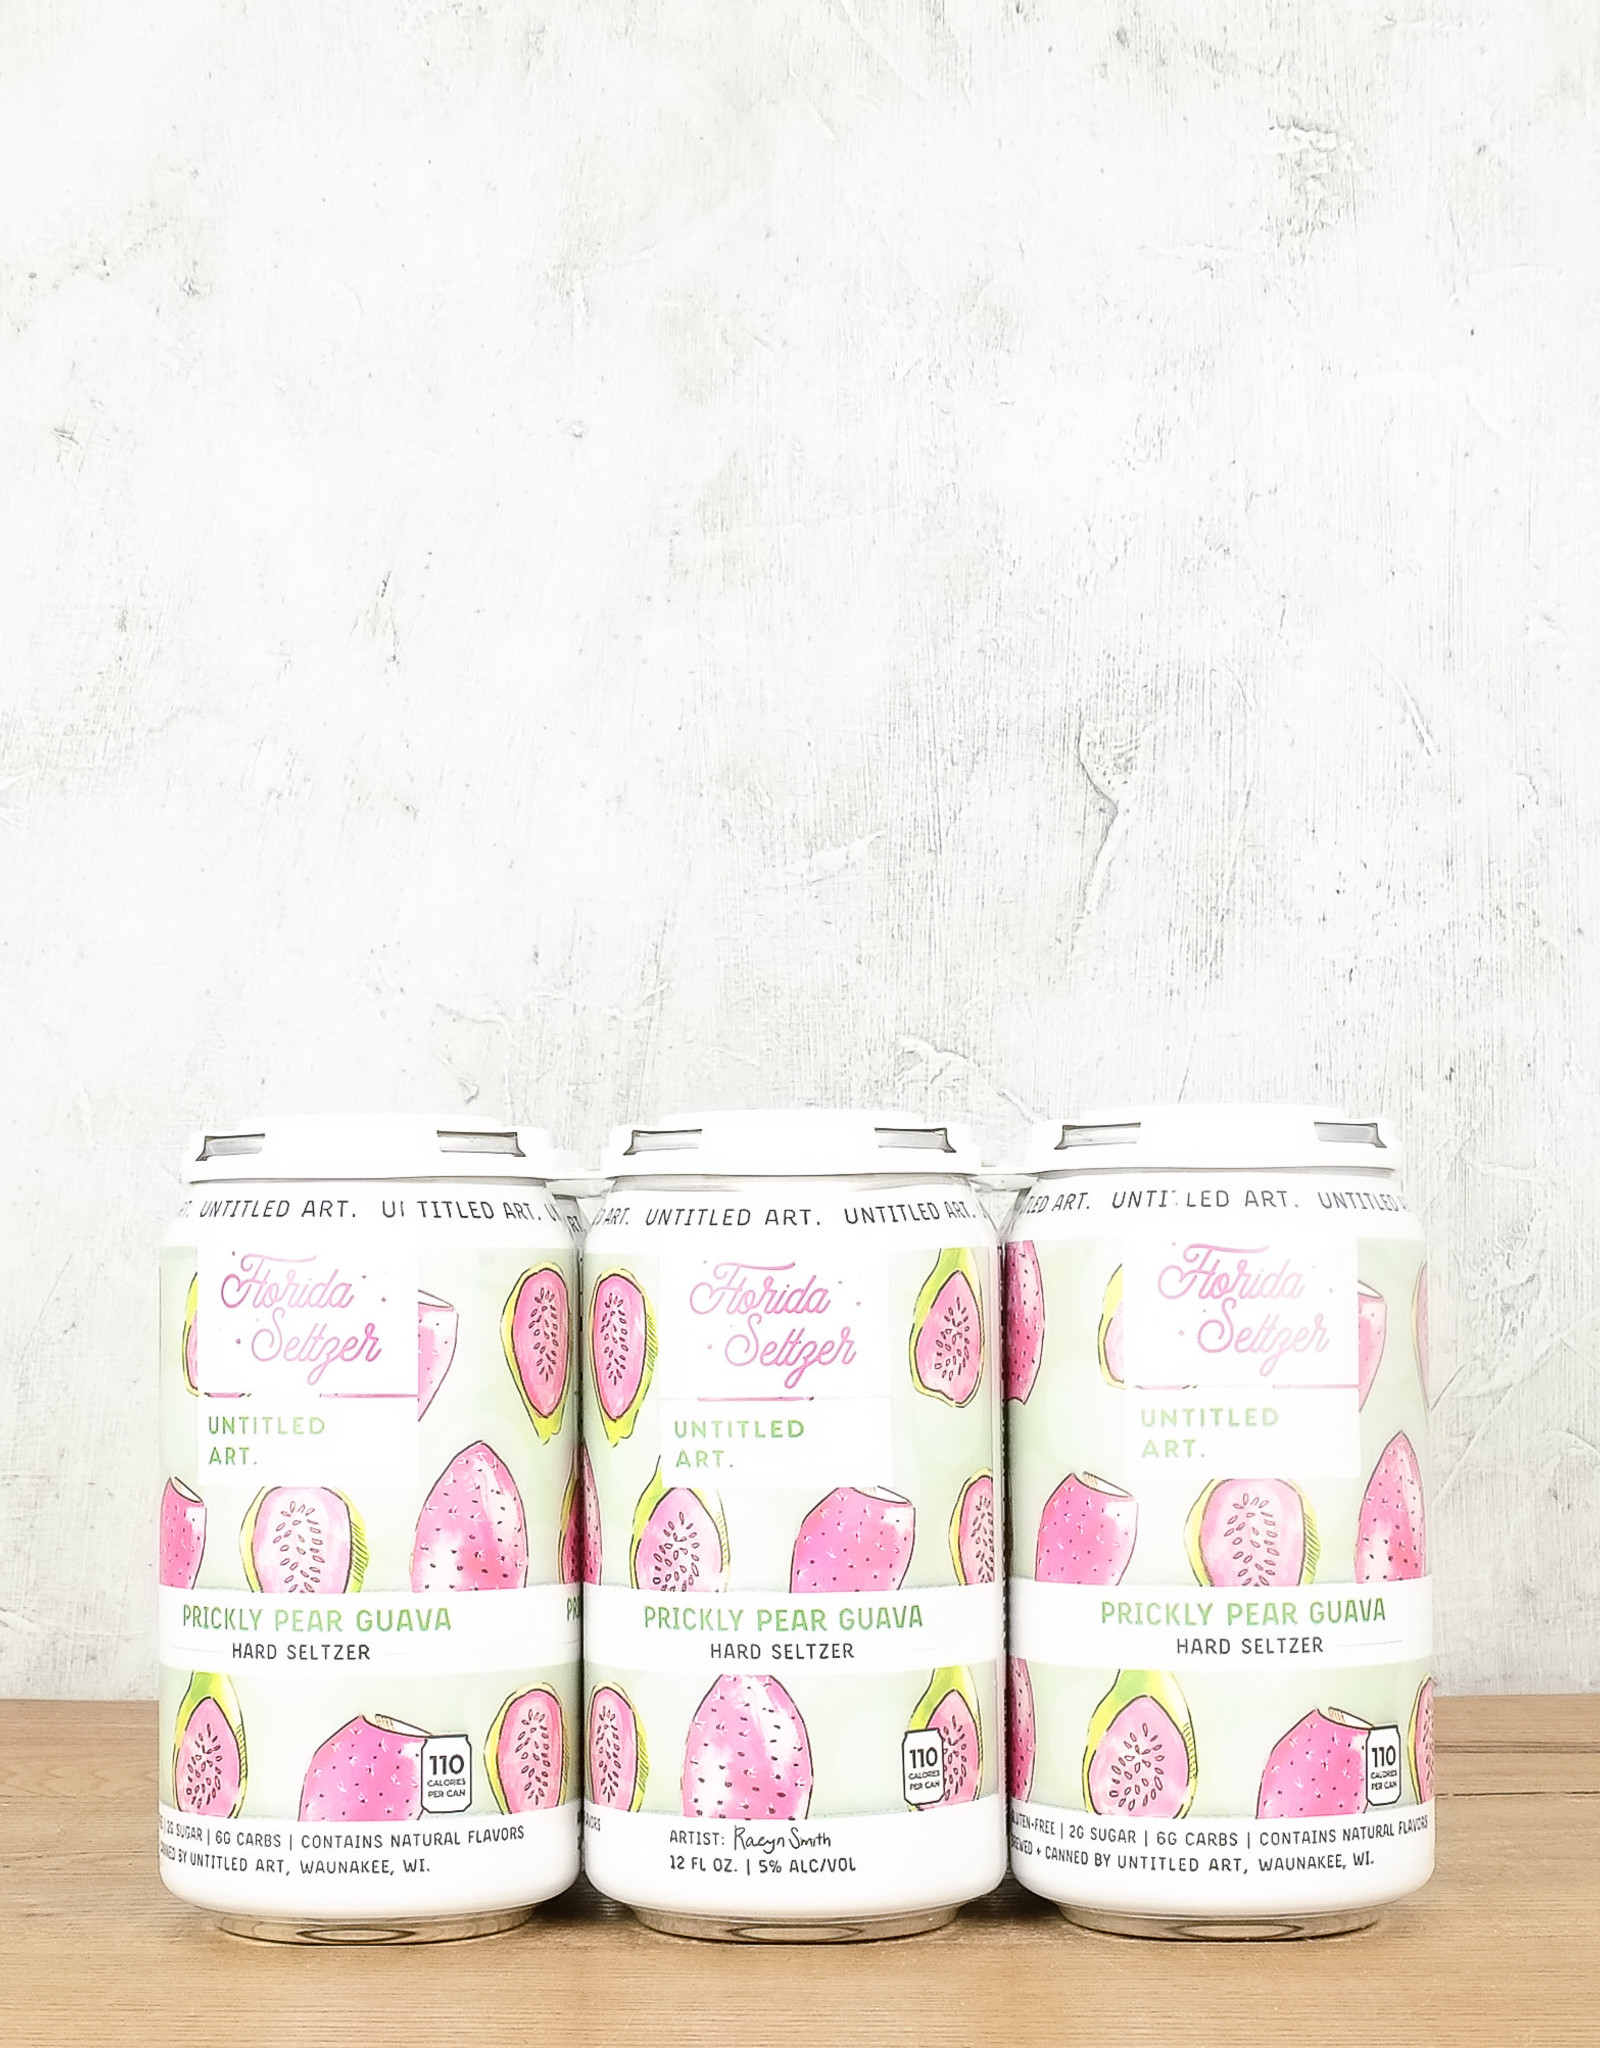 Untitled Arts Pear Guava Hard Seltzer 6pk